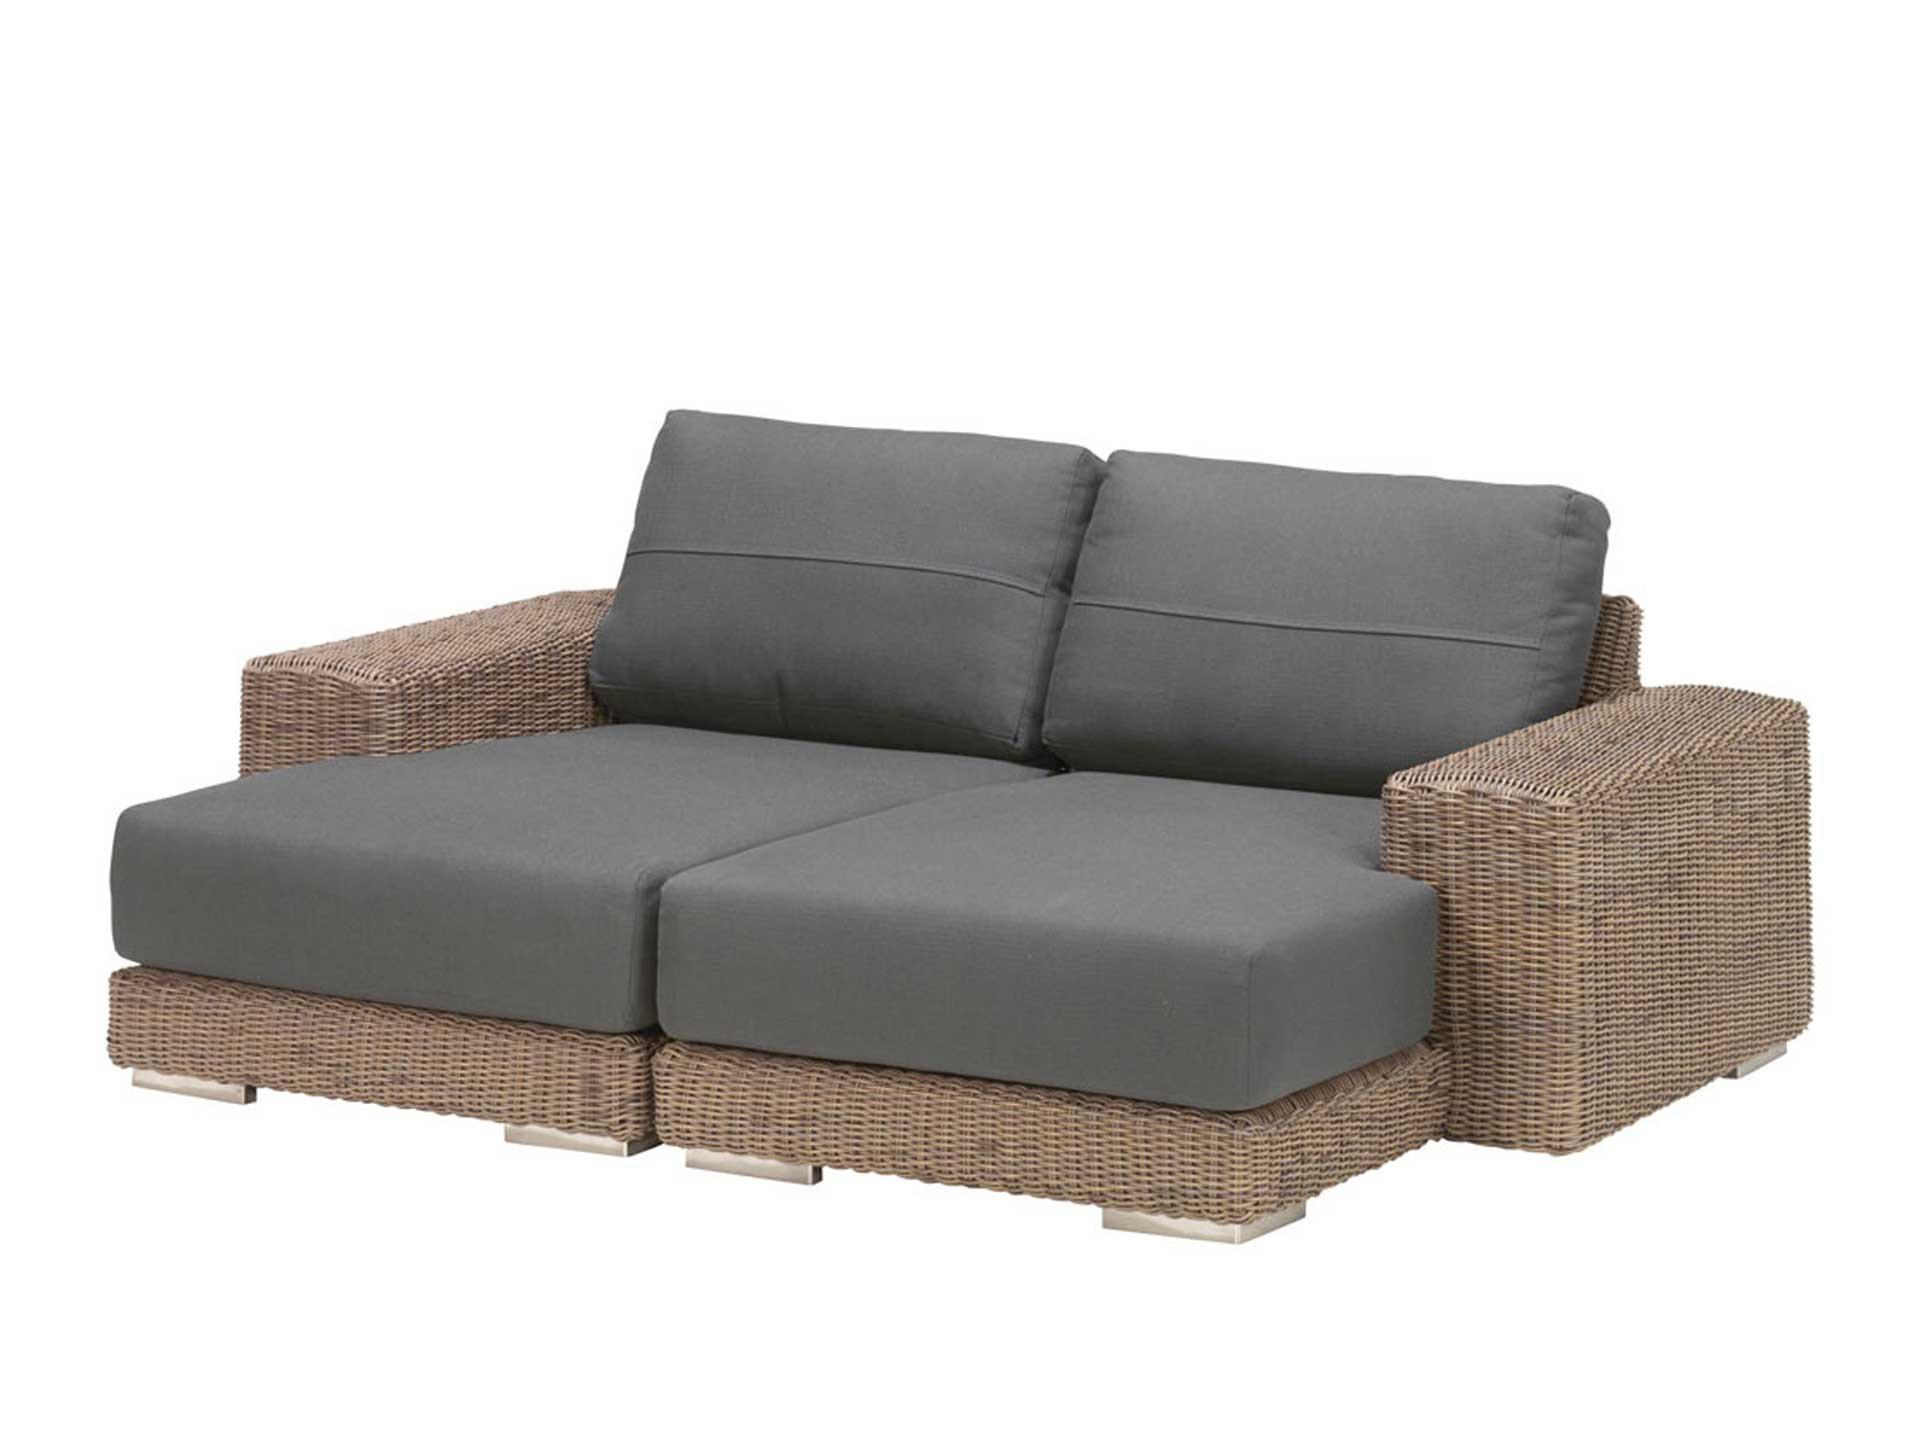 Kingston chaise lounge set